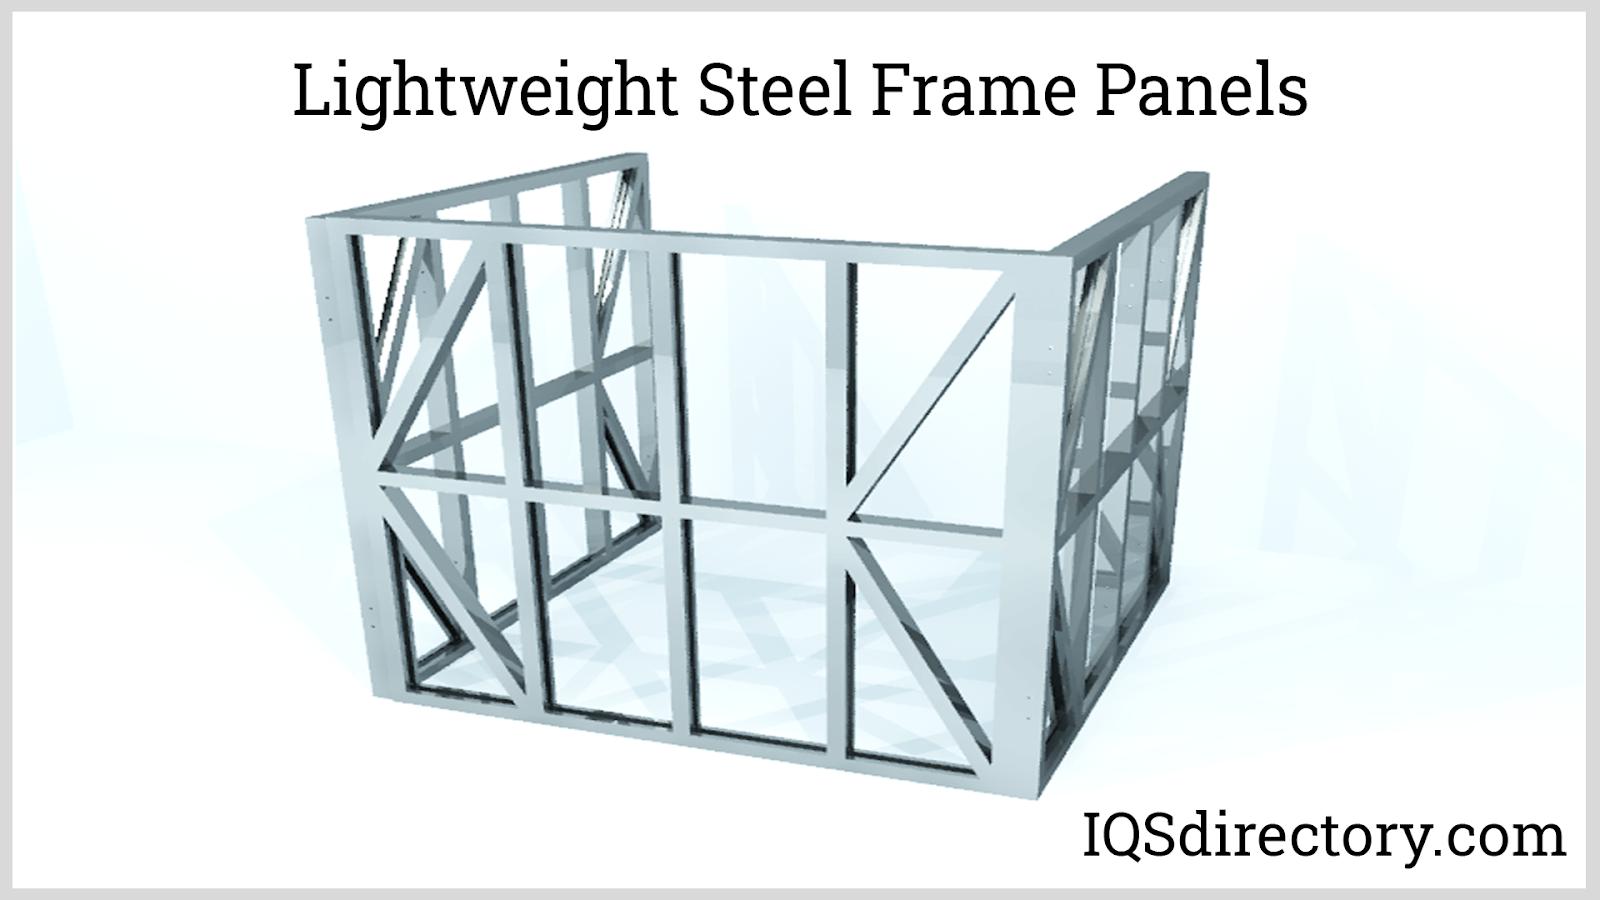 Lightweight Steel Frame Panels